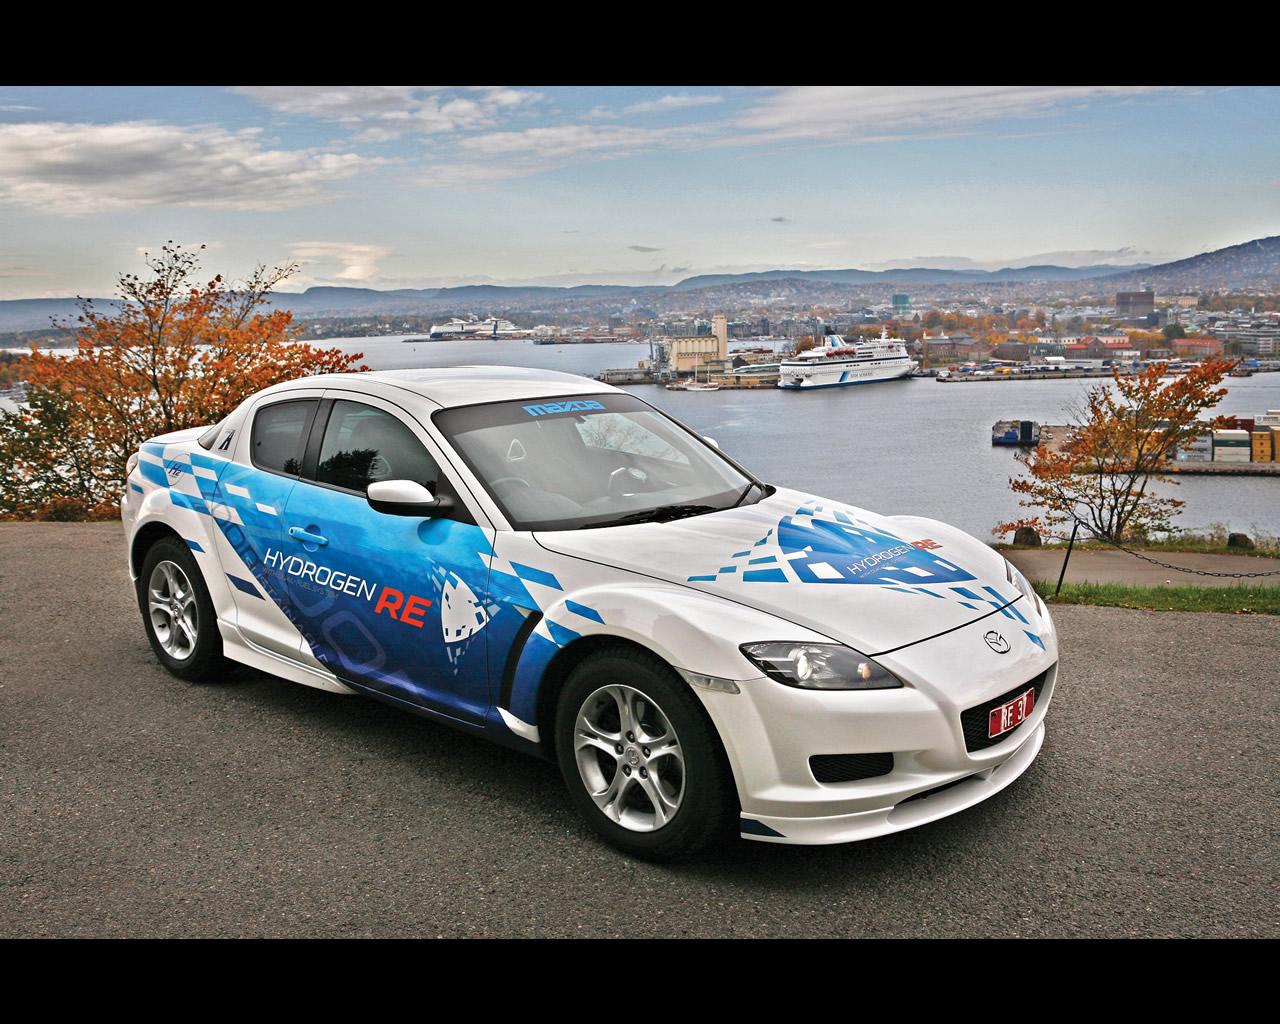 http://autoconcept-reviews.com/cars_reviews/mazda/mazda-rx-8-hydrogen-2003-2009/wallpaper/11.jpg